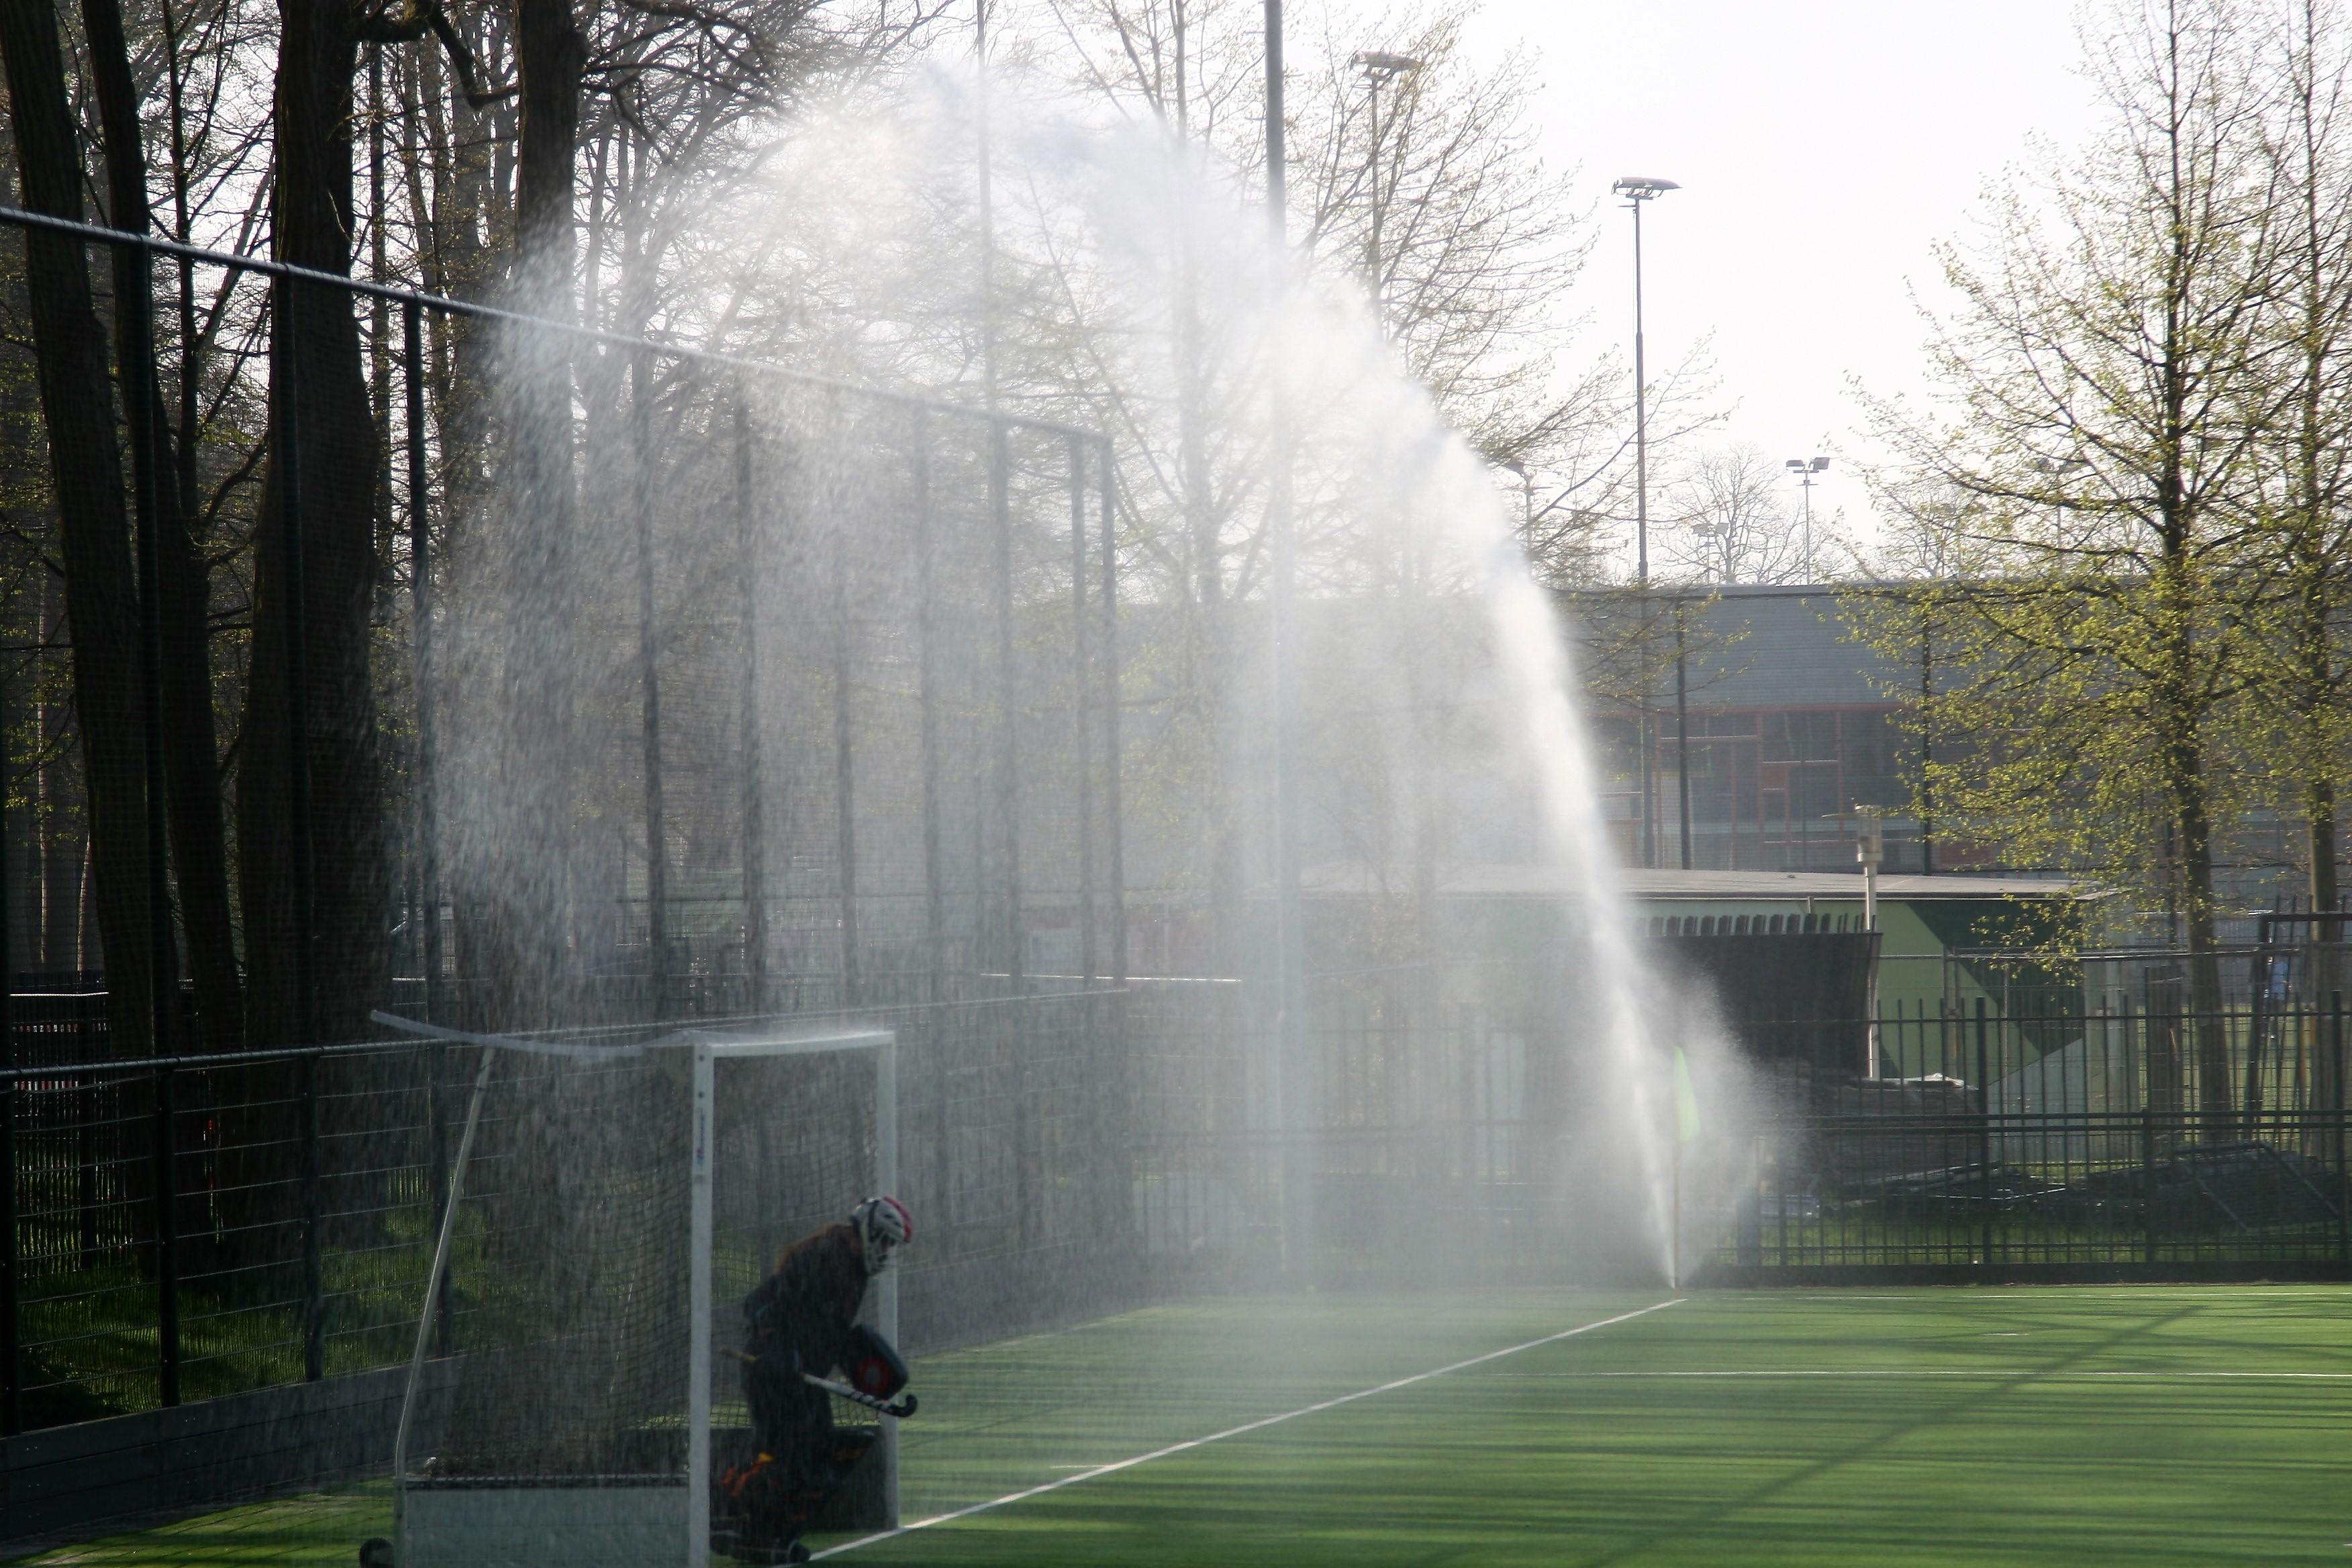 Fotograaf: Vincent Hendrikse 'Radboud Universiteit'